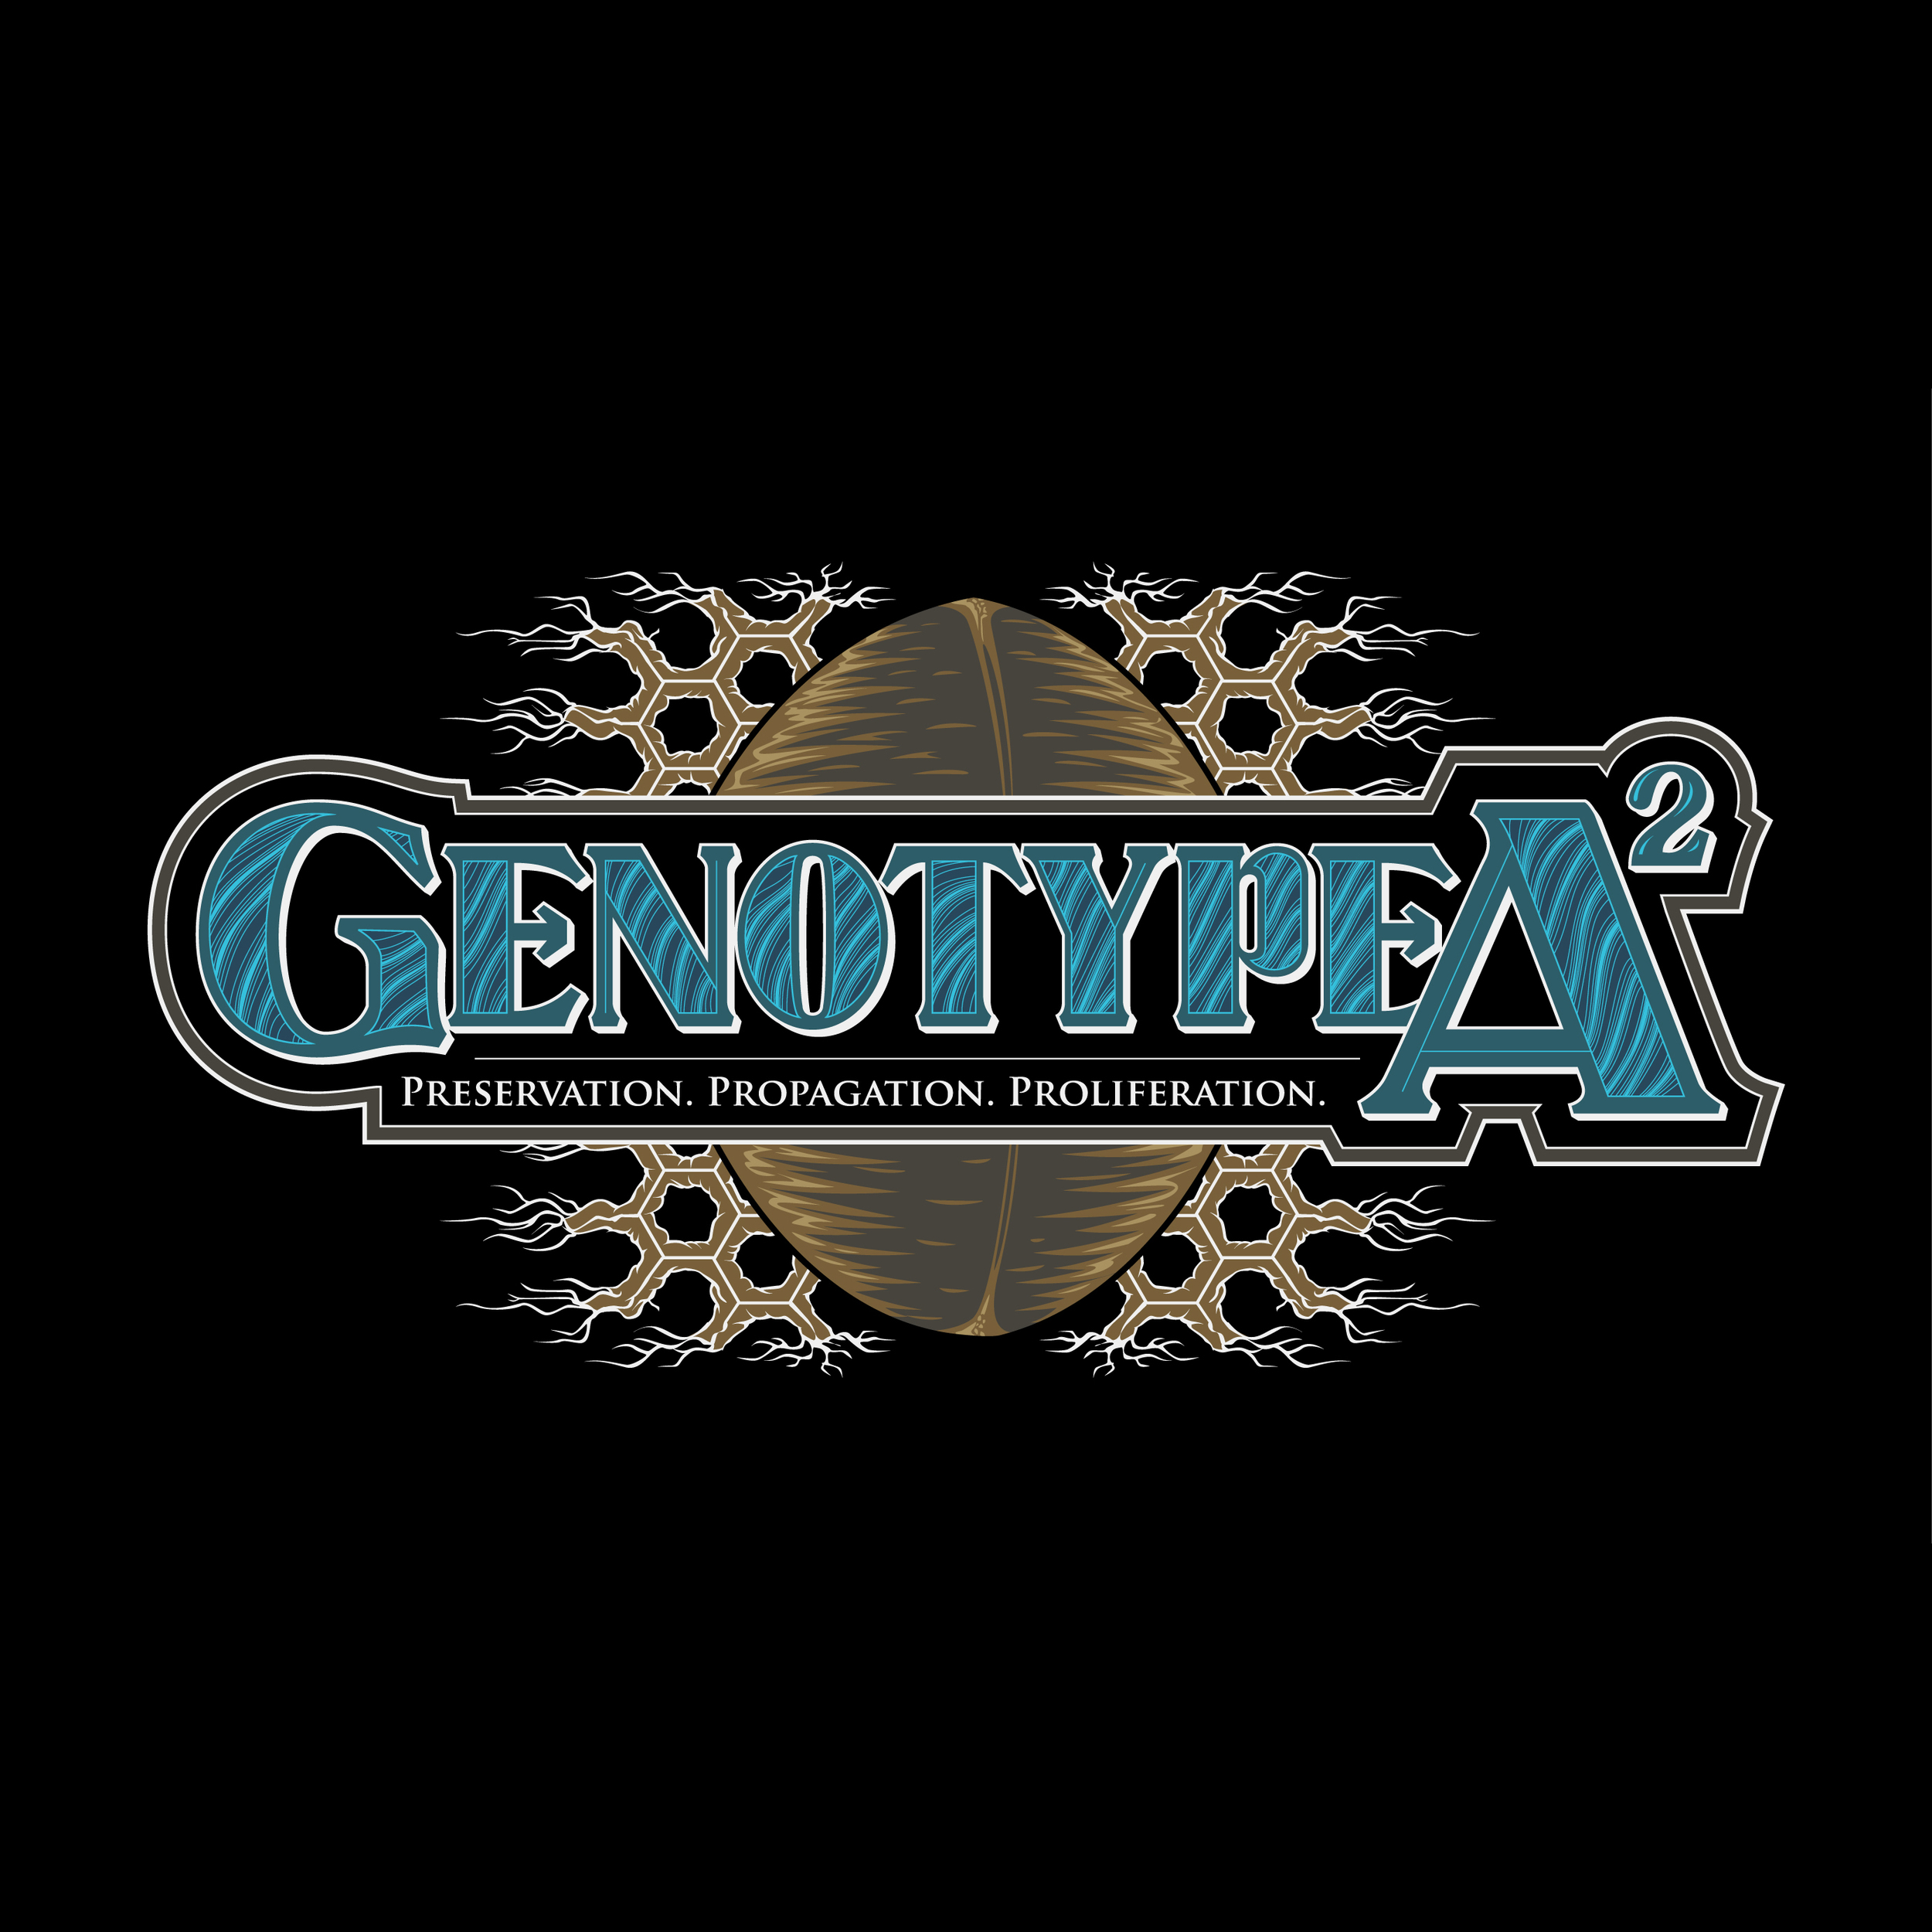 genotype_a2_logo_FINAL_A_square.jpg